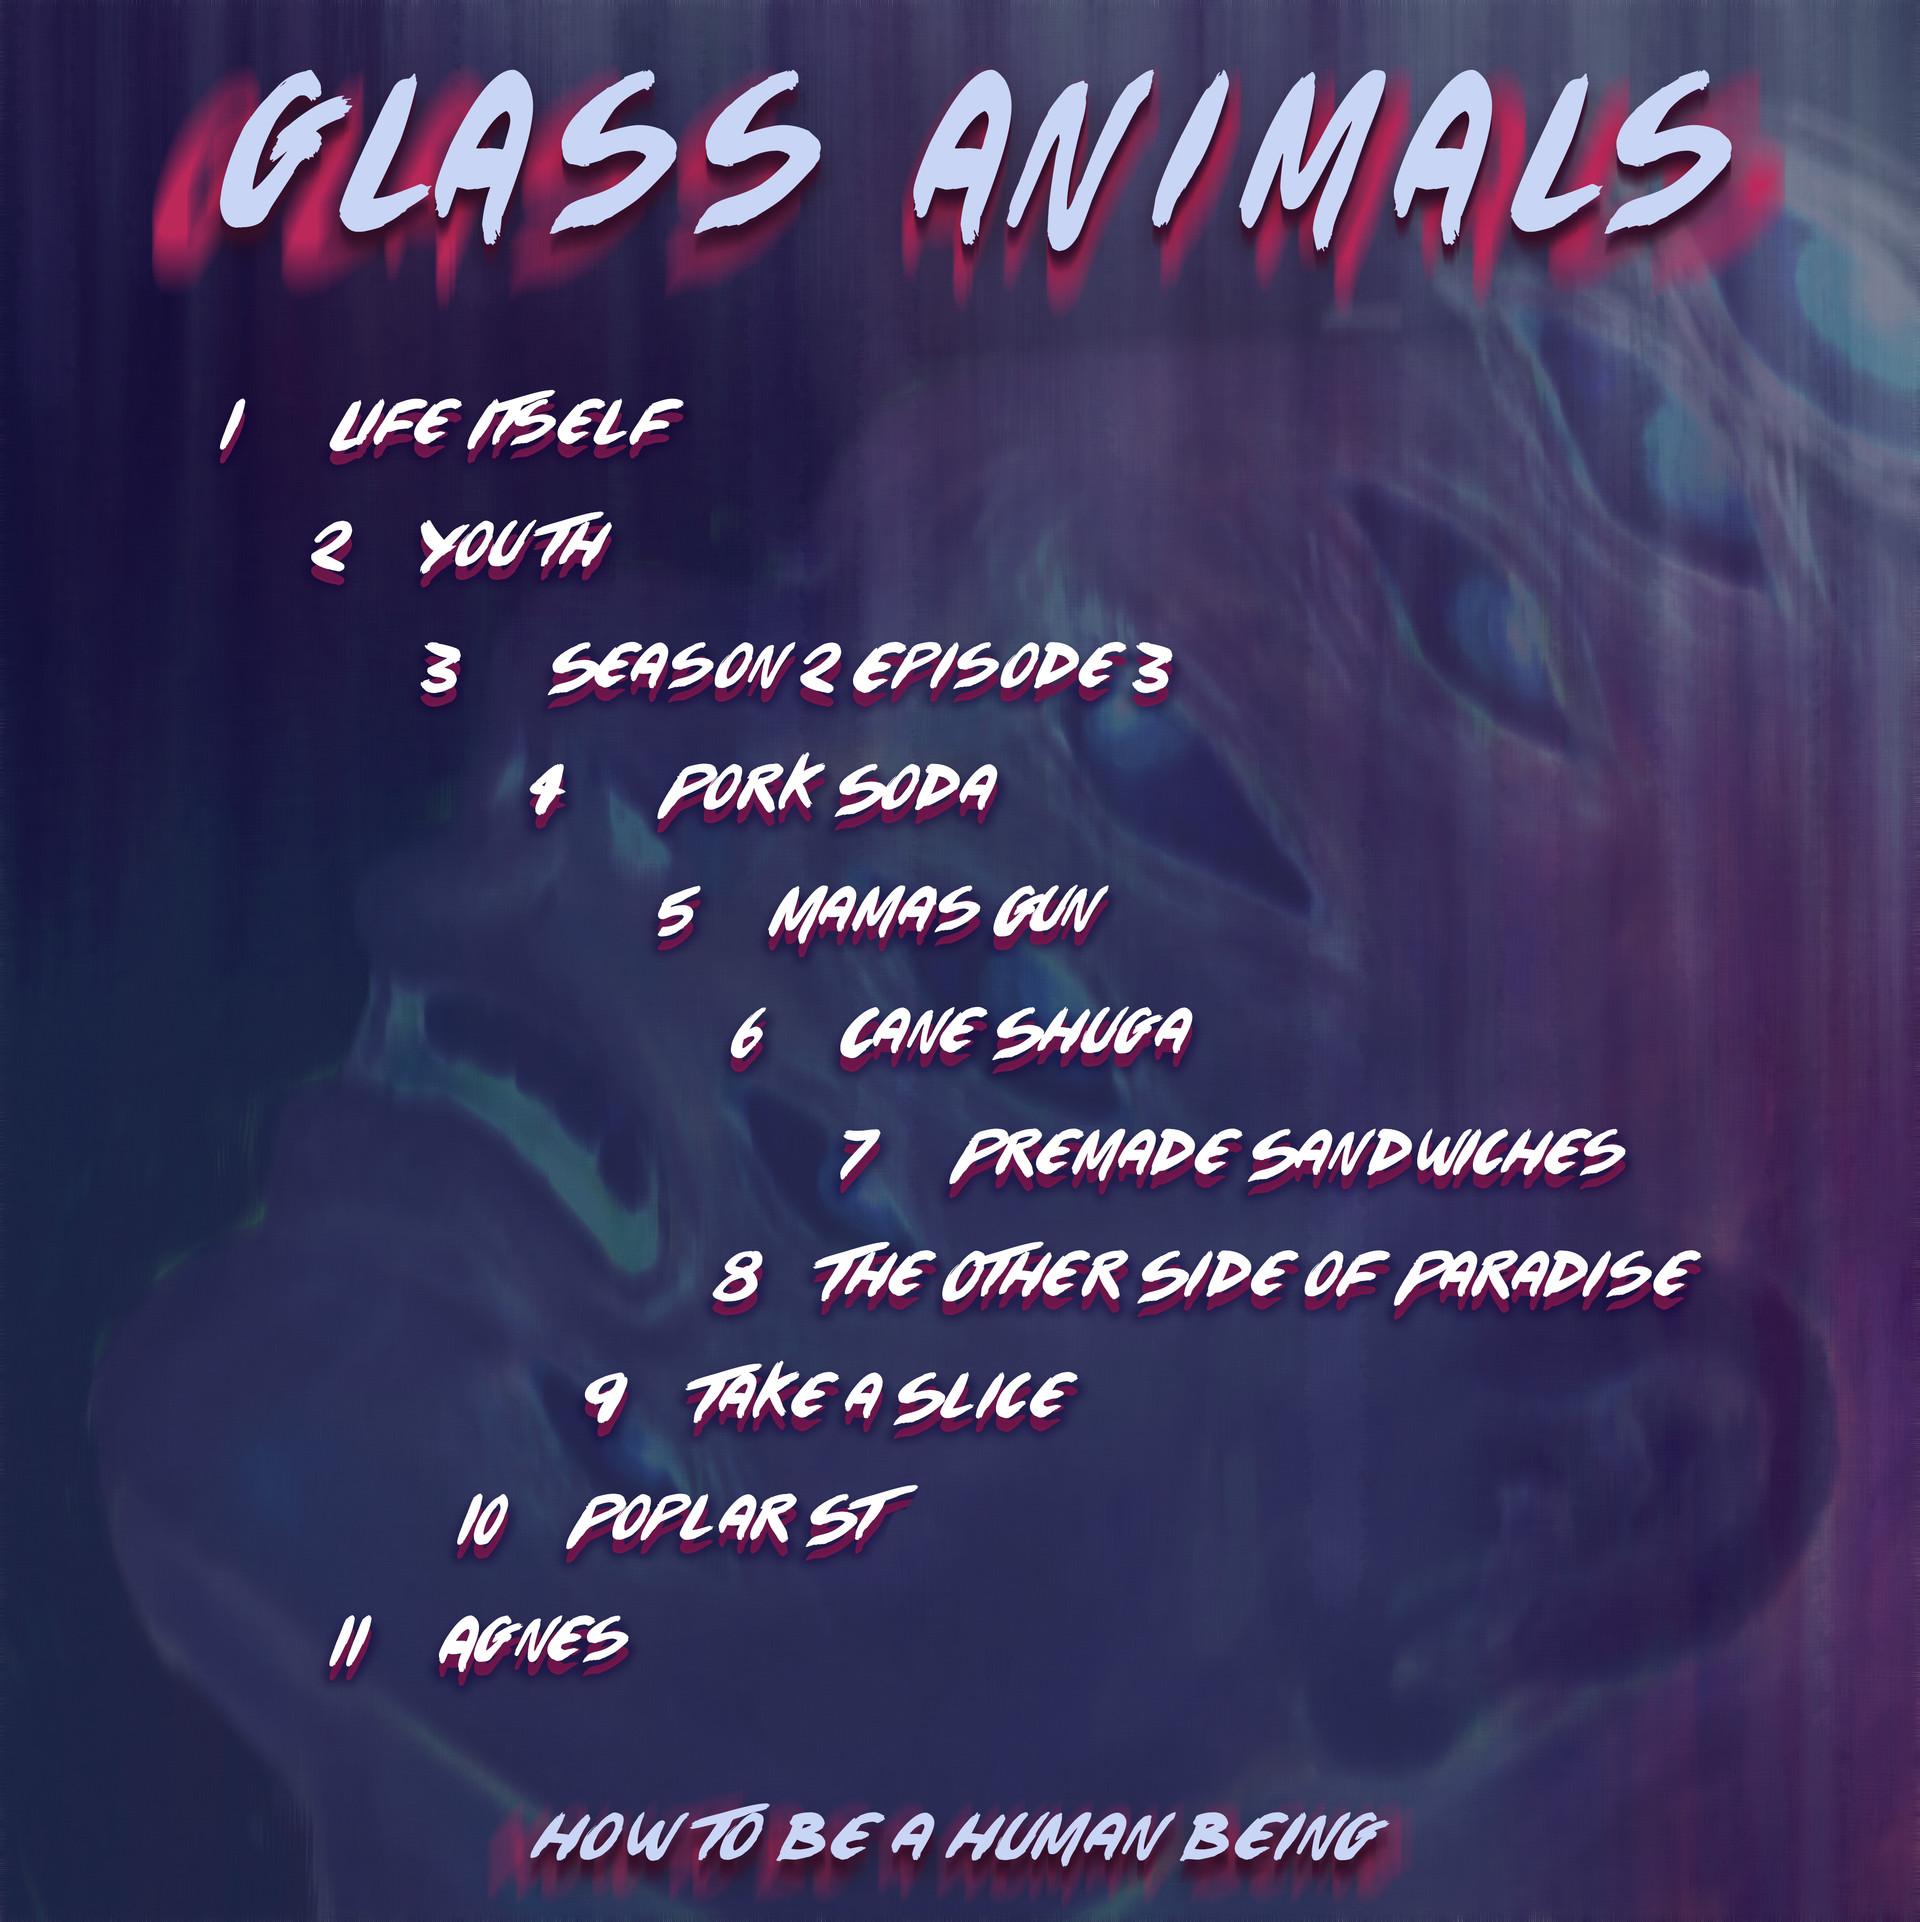 Marina Salvatore Glass Animals Album Cover